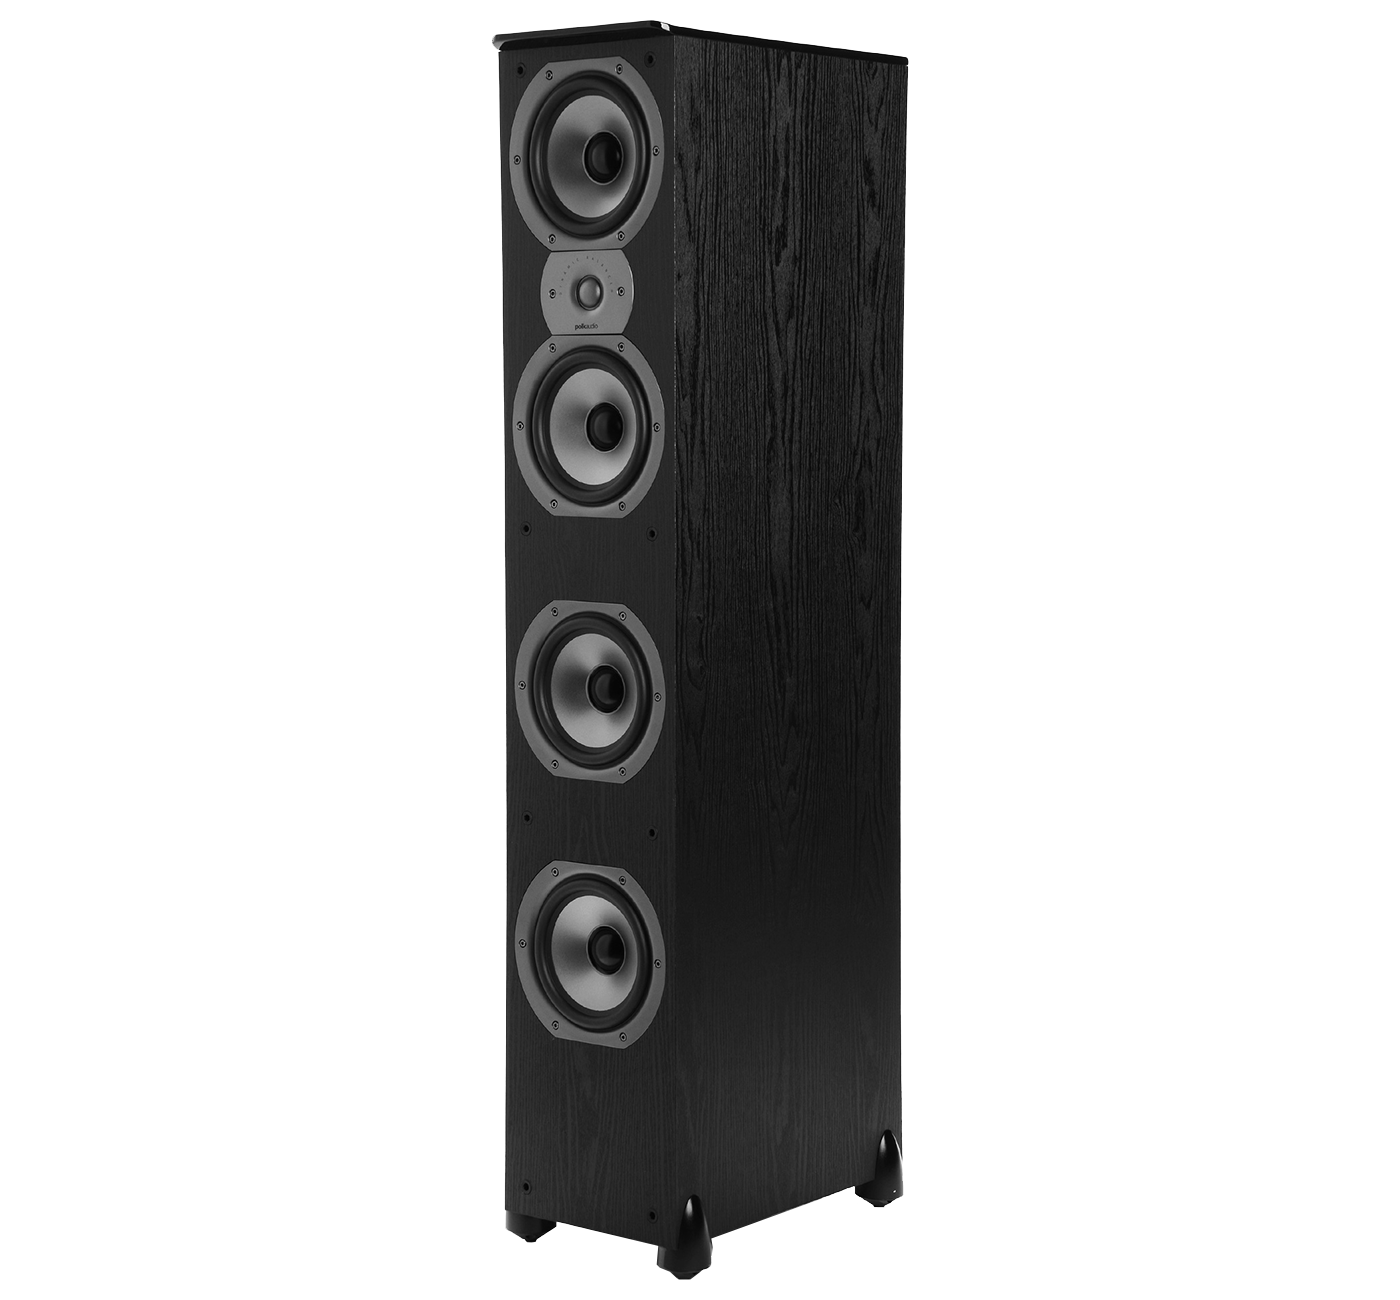 Tsi500 Polk Audio